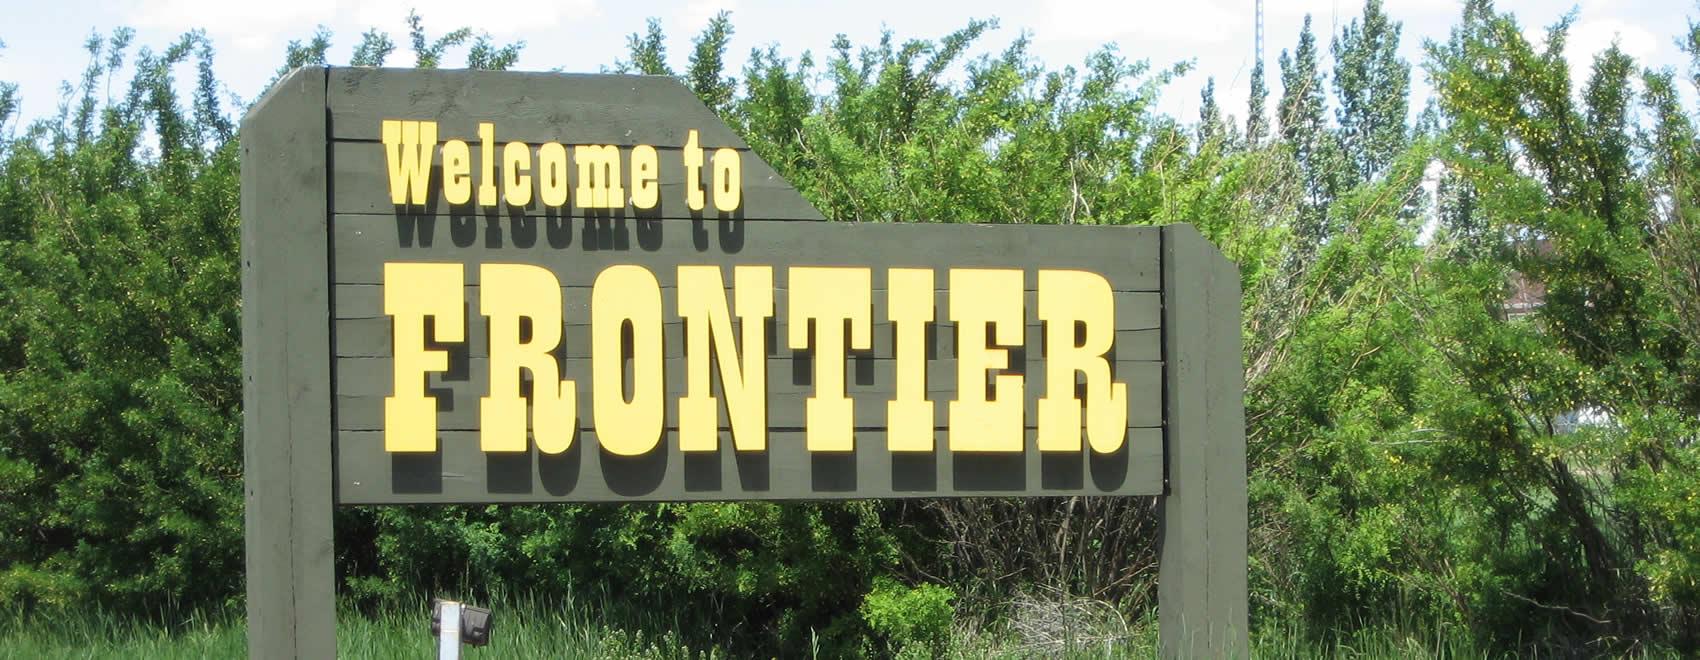 Village of Frontier